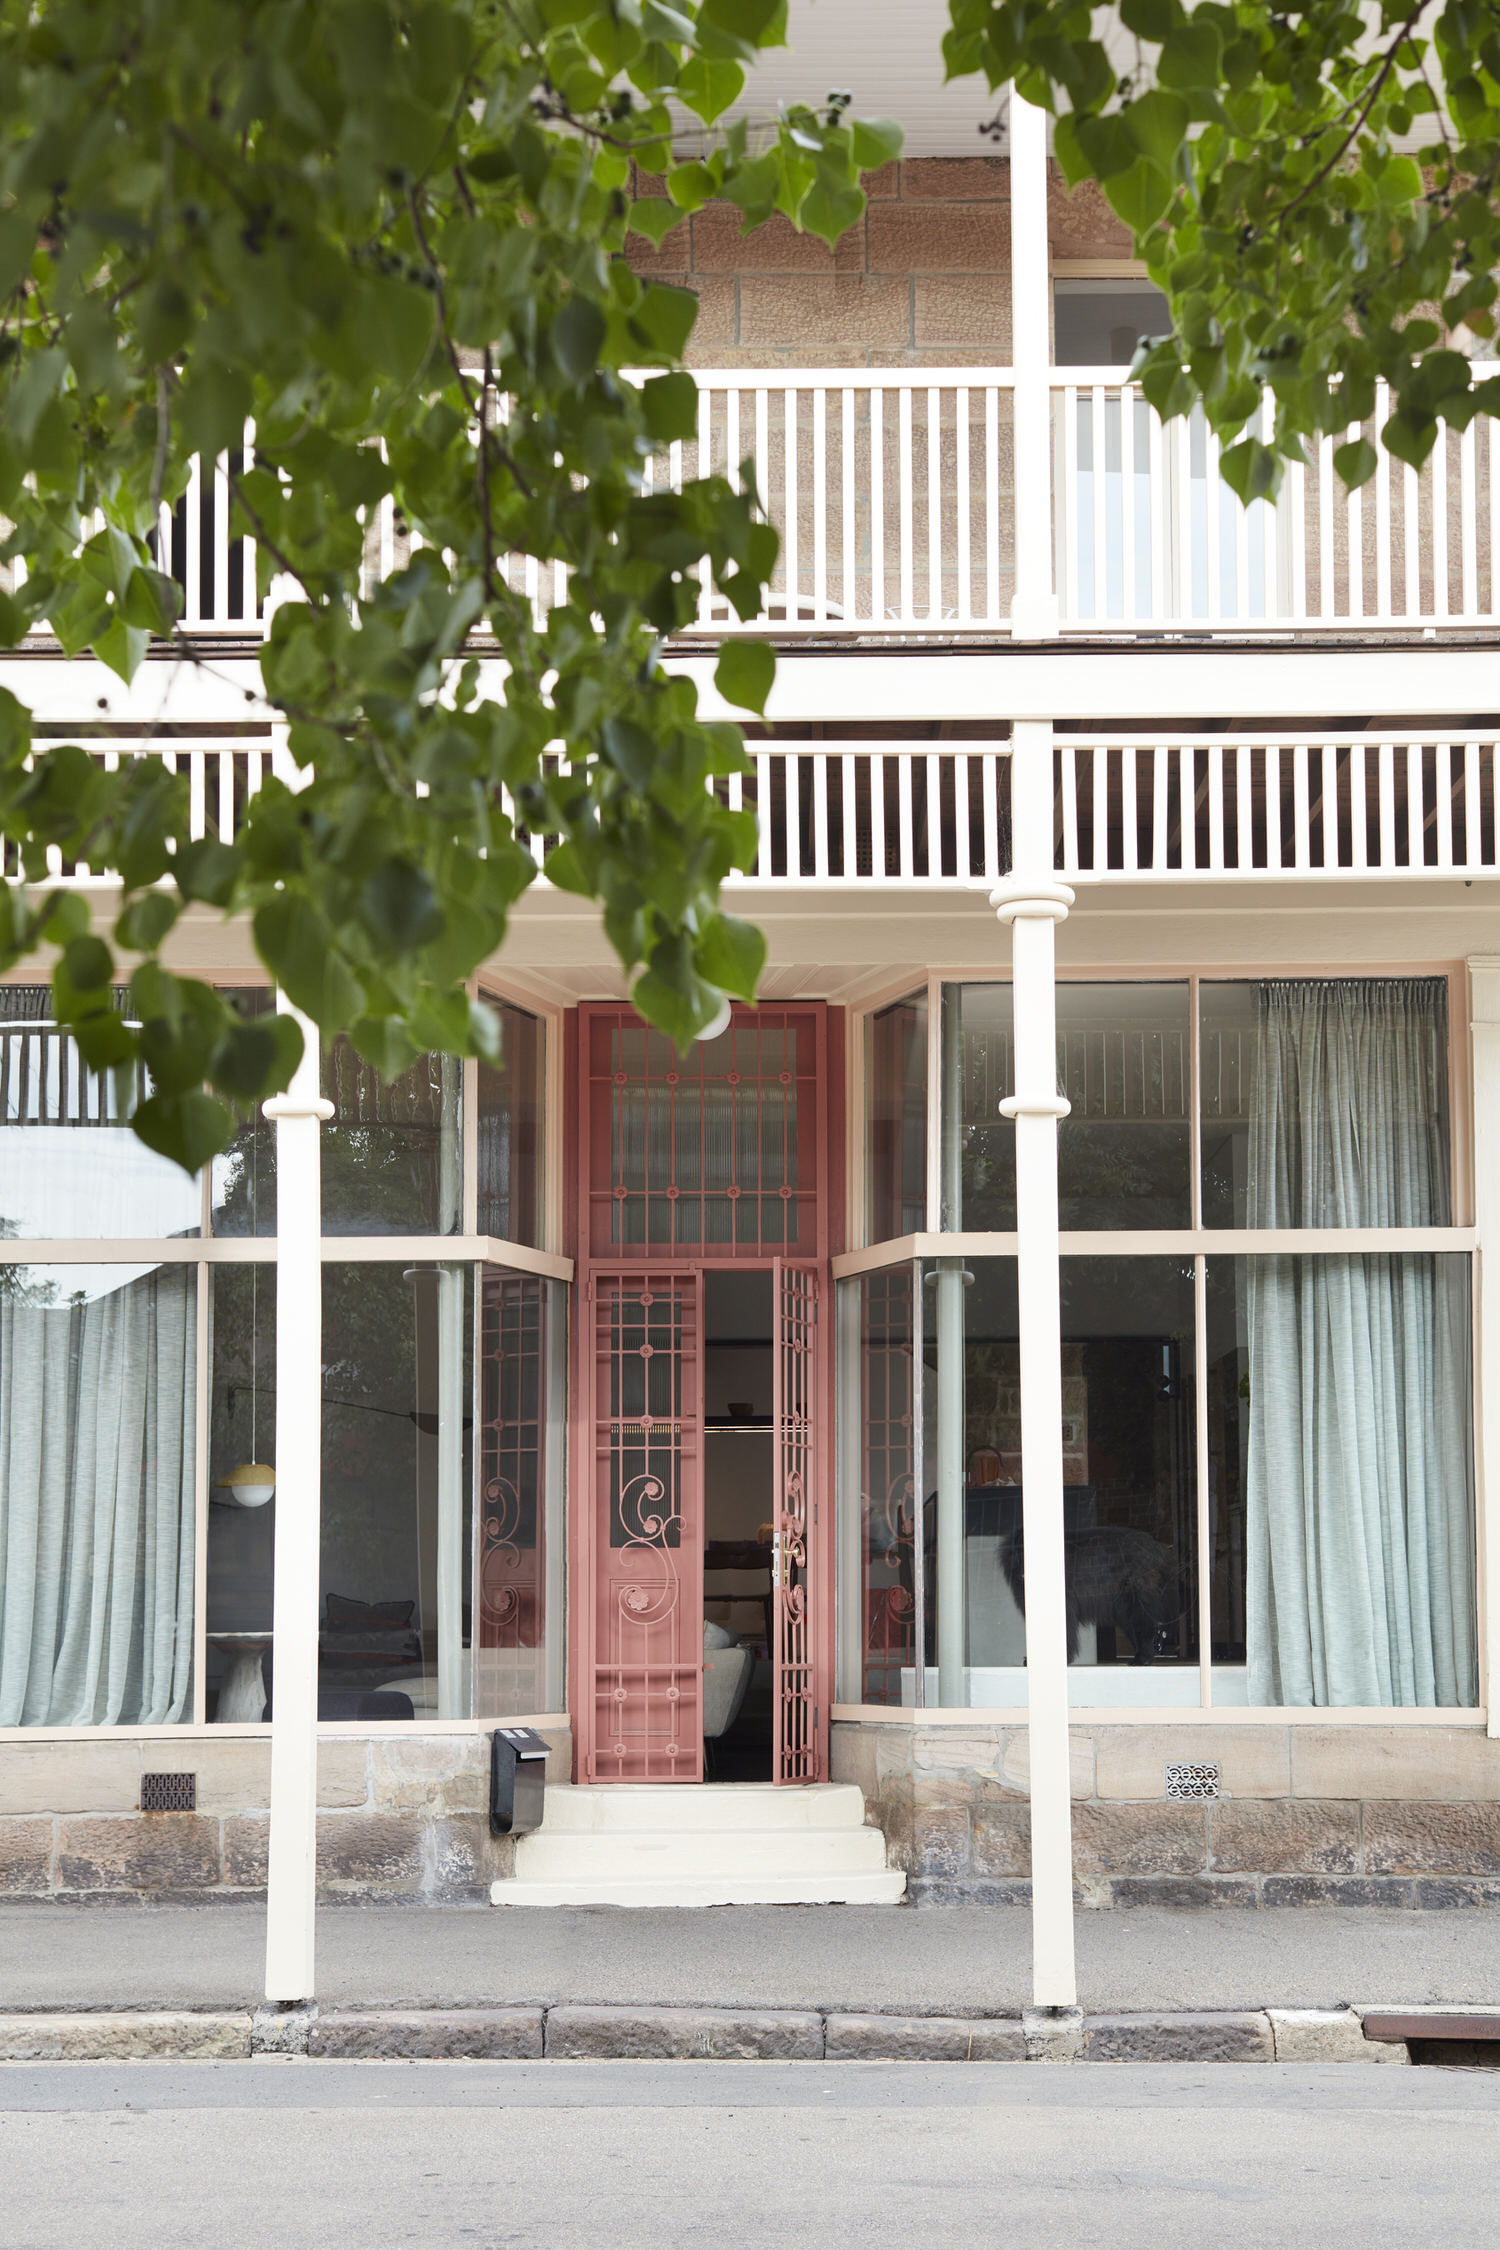 Ysg Studio Soft Serve 75 Evans St Rozelle Sydney Property Photo Prue Ruscoe Yellowtrace 01